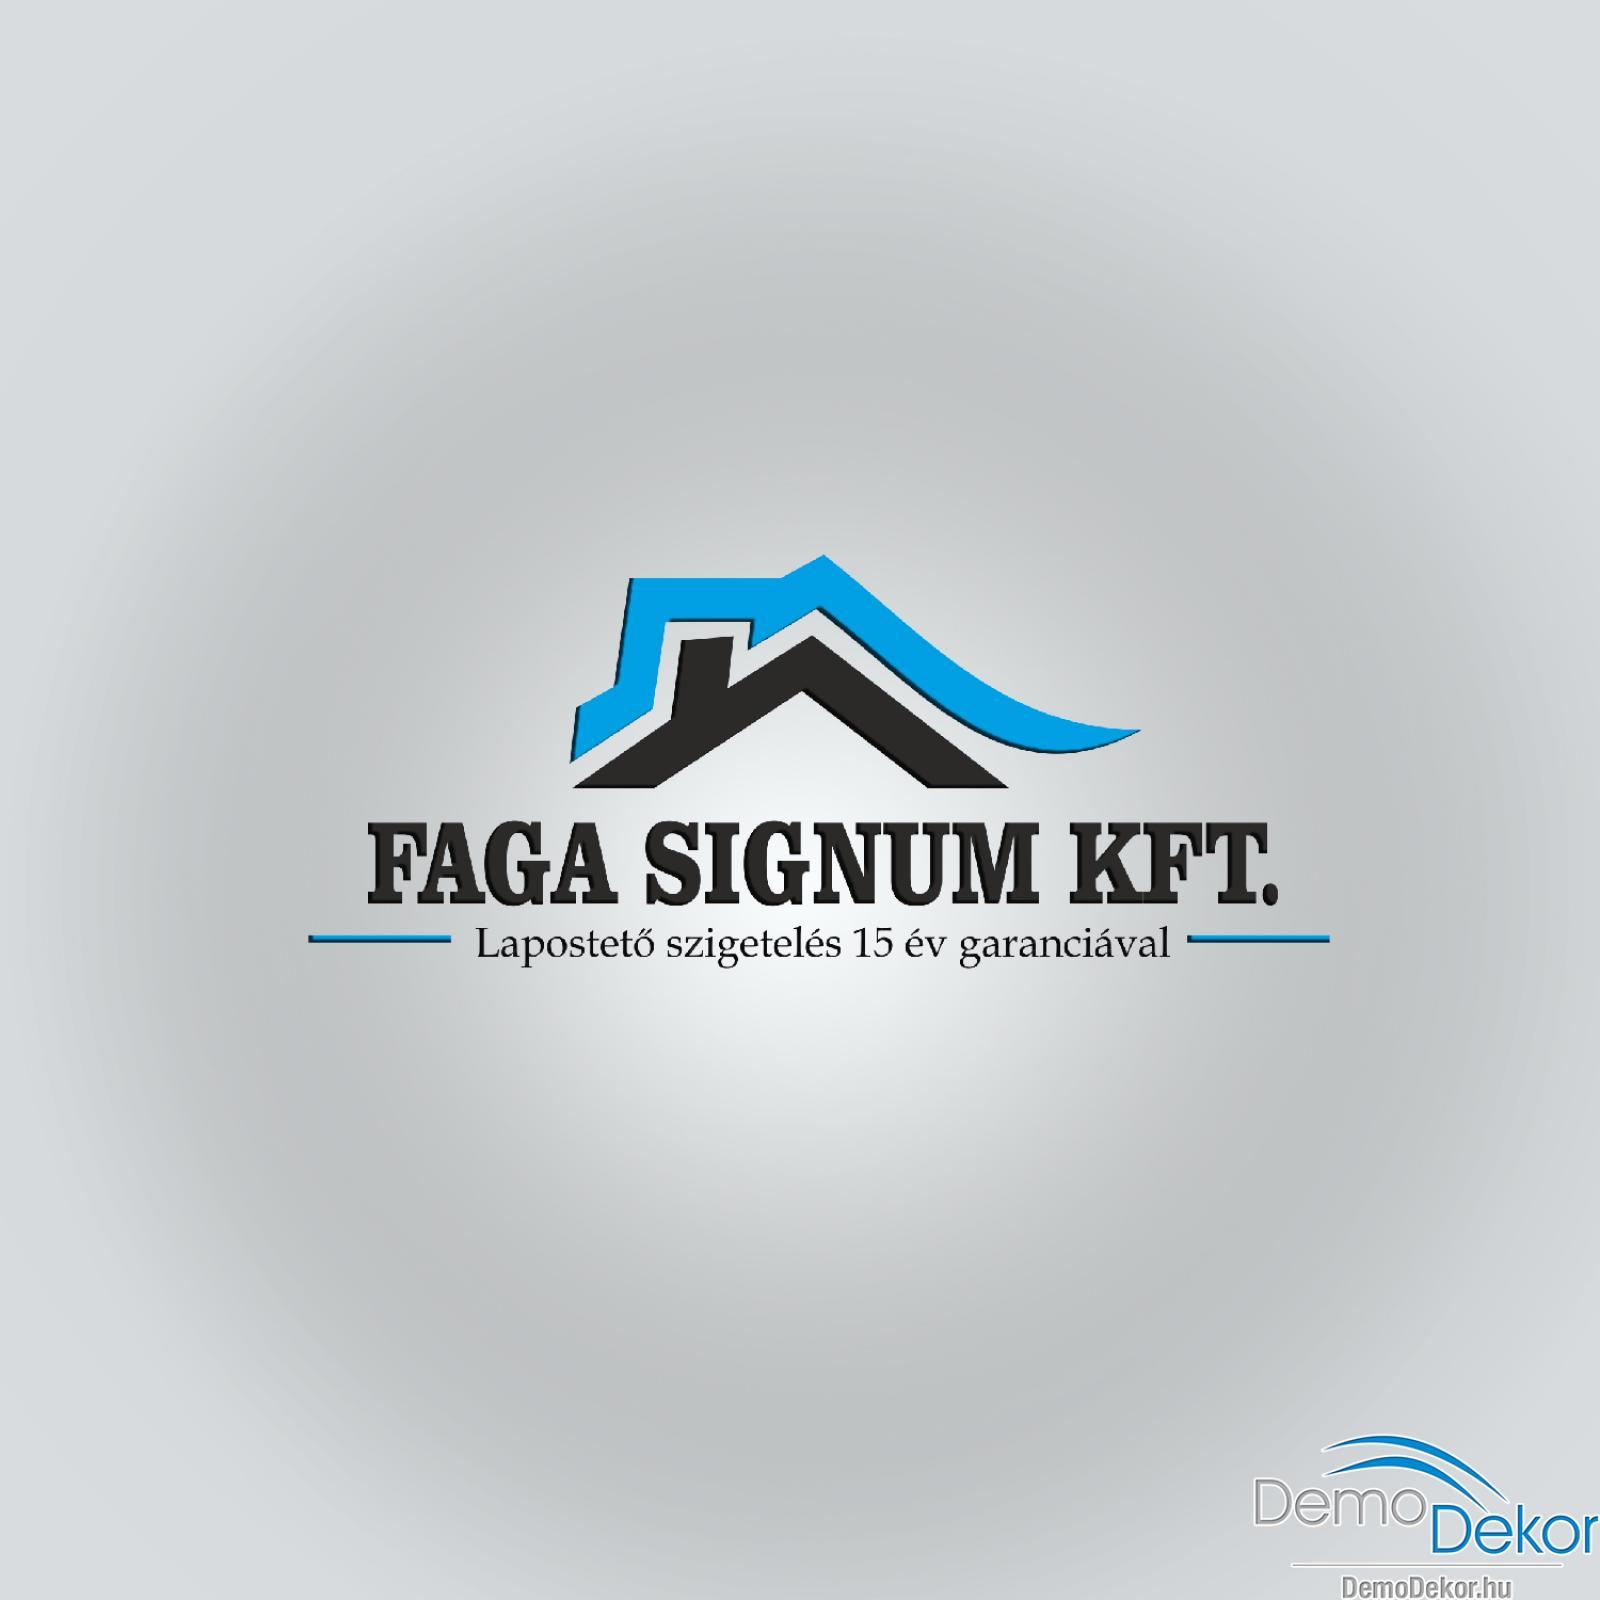 Faga Signum Kft. Budapest